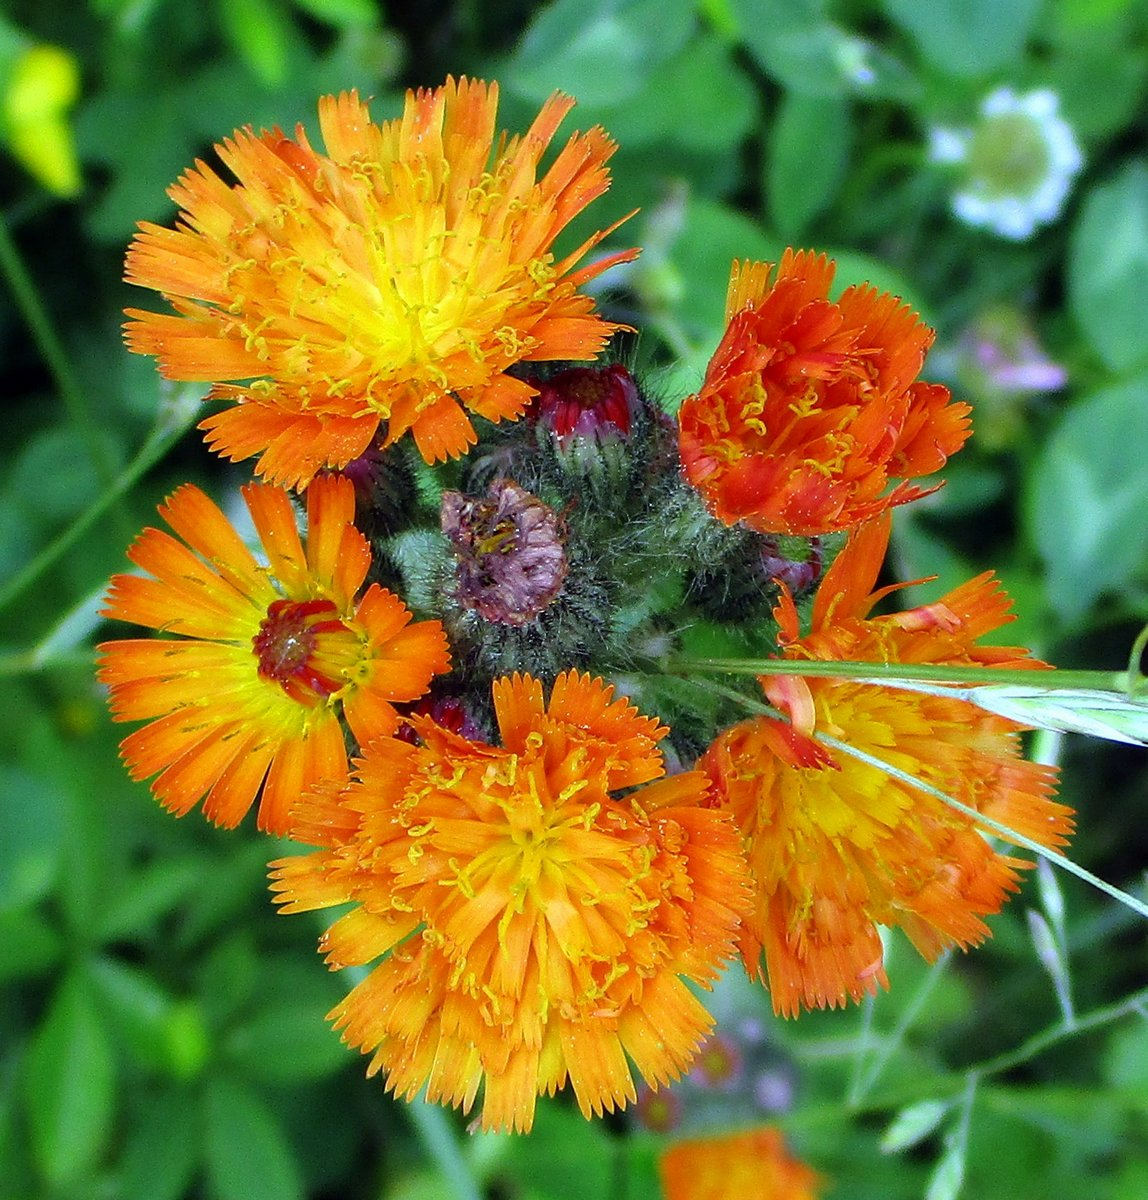 4. Orange Hawkweed